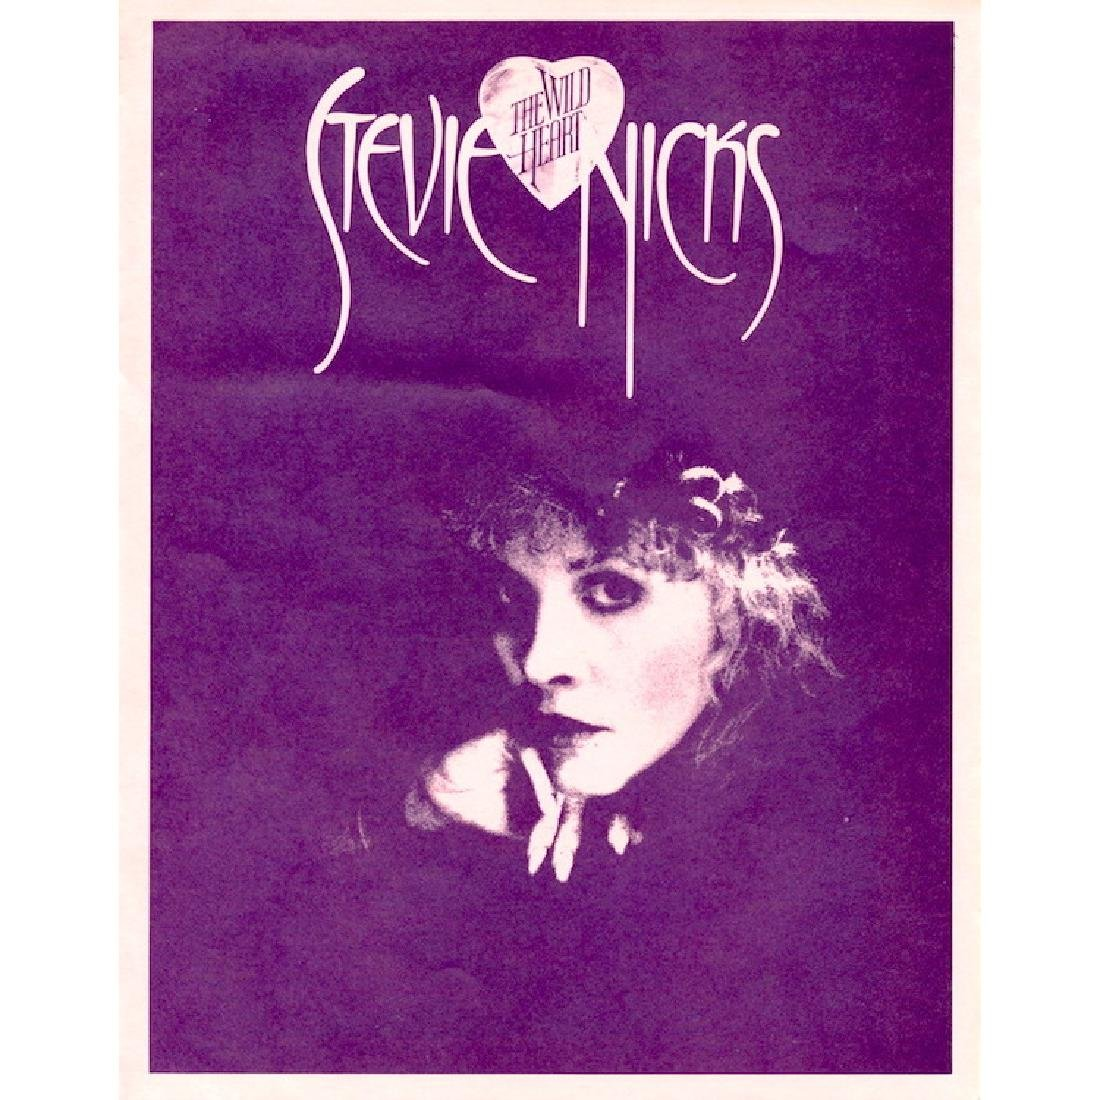 Stevie Nicks - The Wild Heart - Tri-fold Press Release